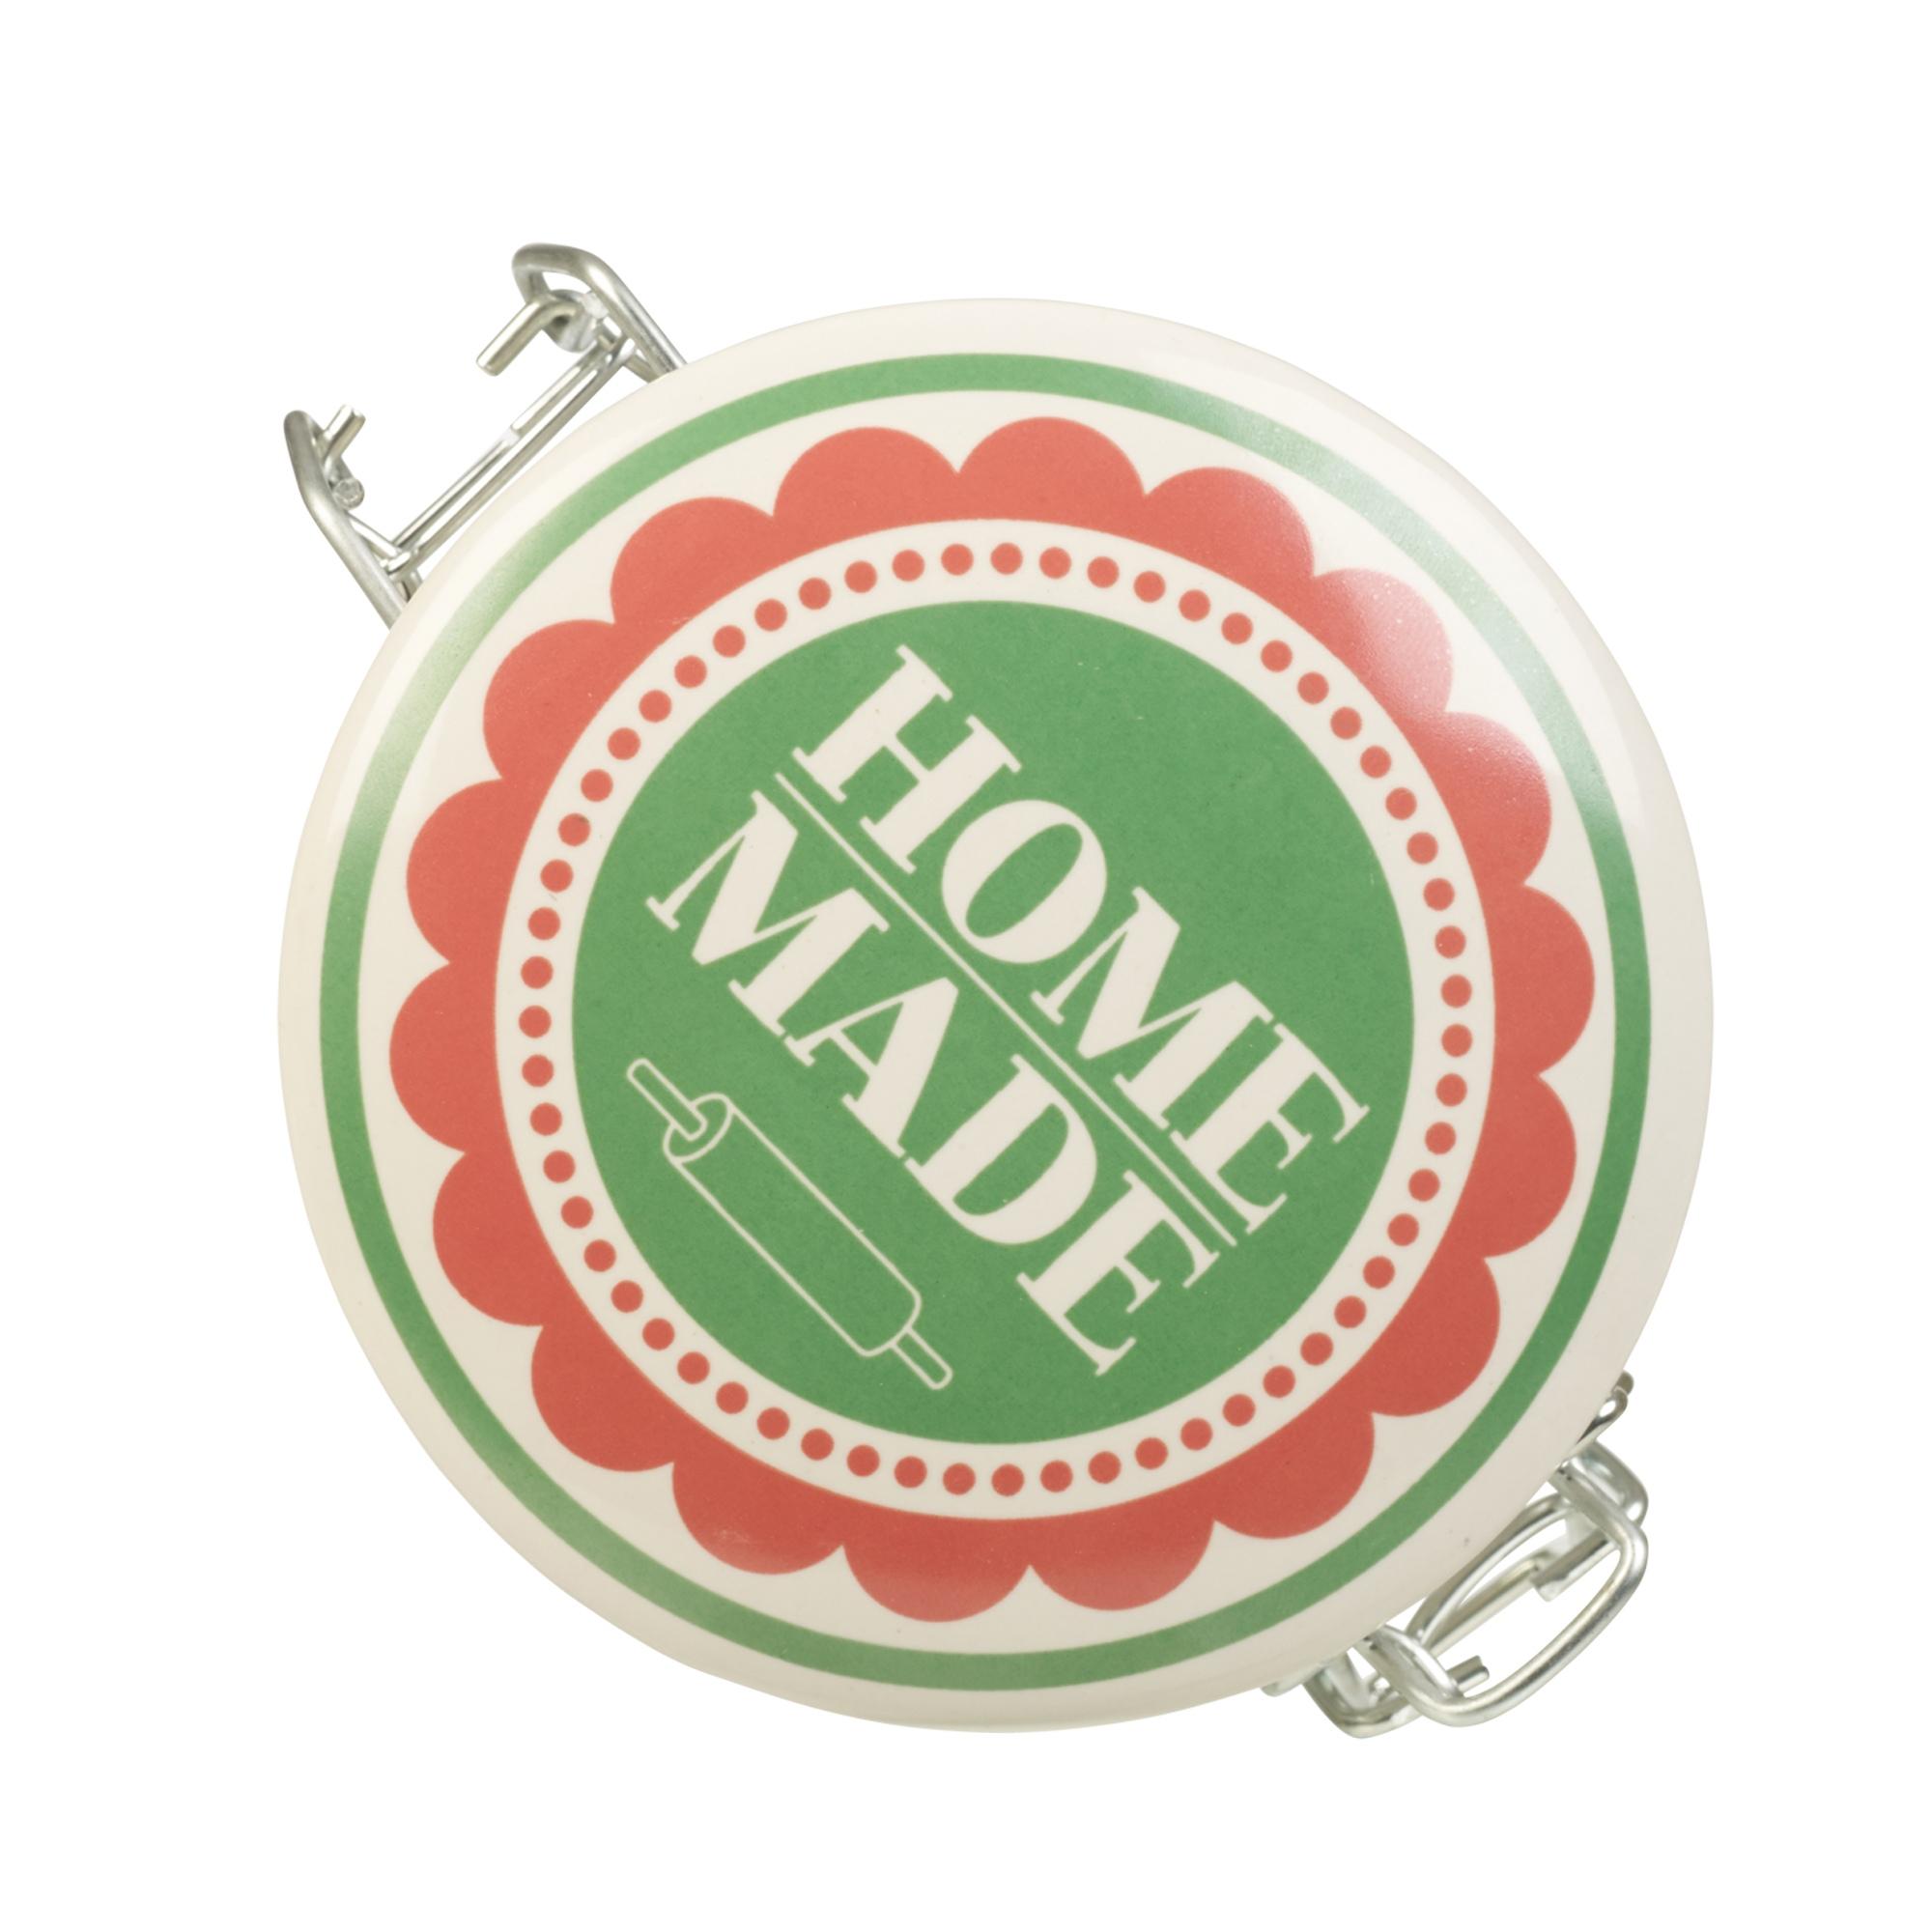 r tro bocal de stockage en verre collier en m tal herm tique joint en silicone ebay. Black Bedroom Furniture Sets. Home Design Ideas